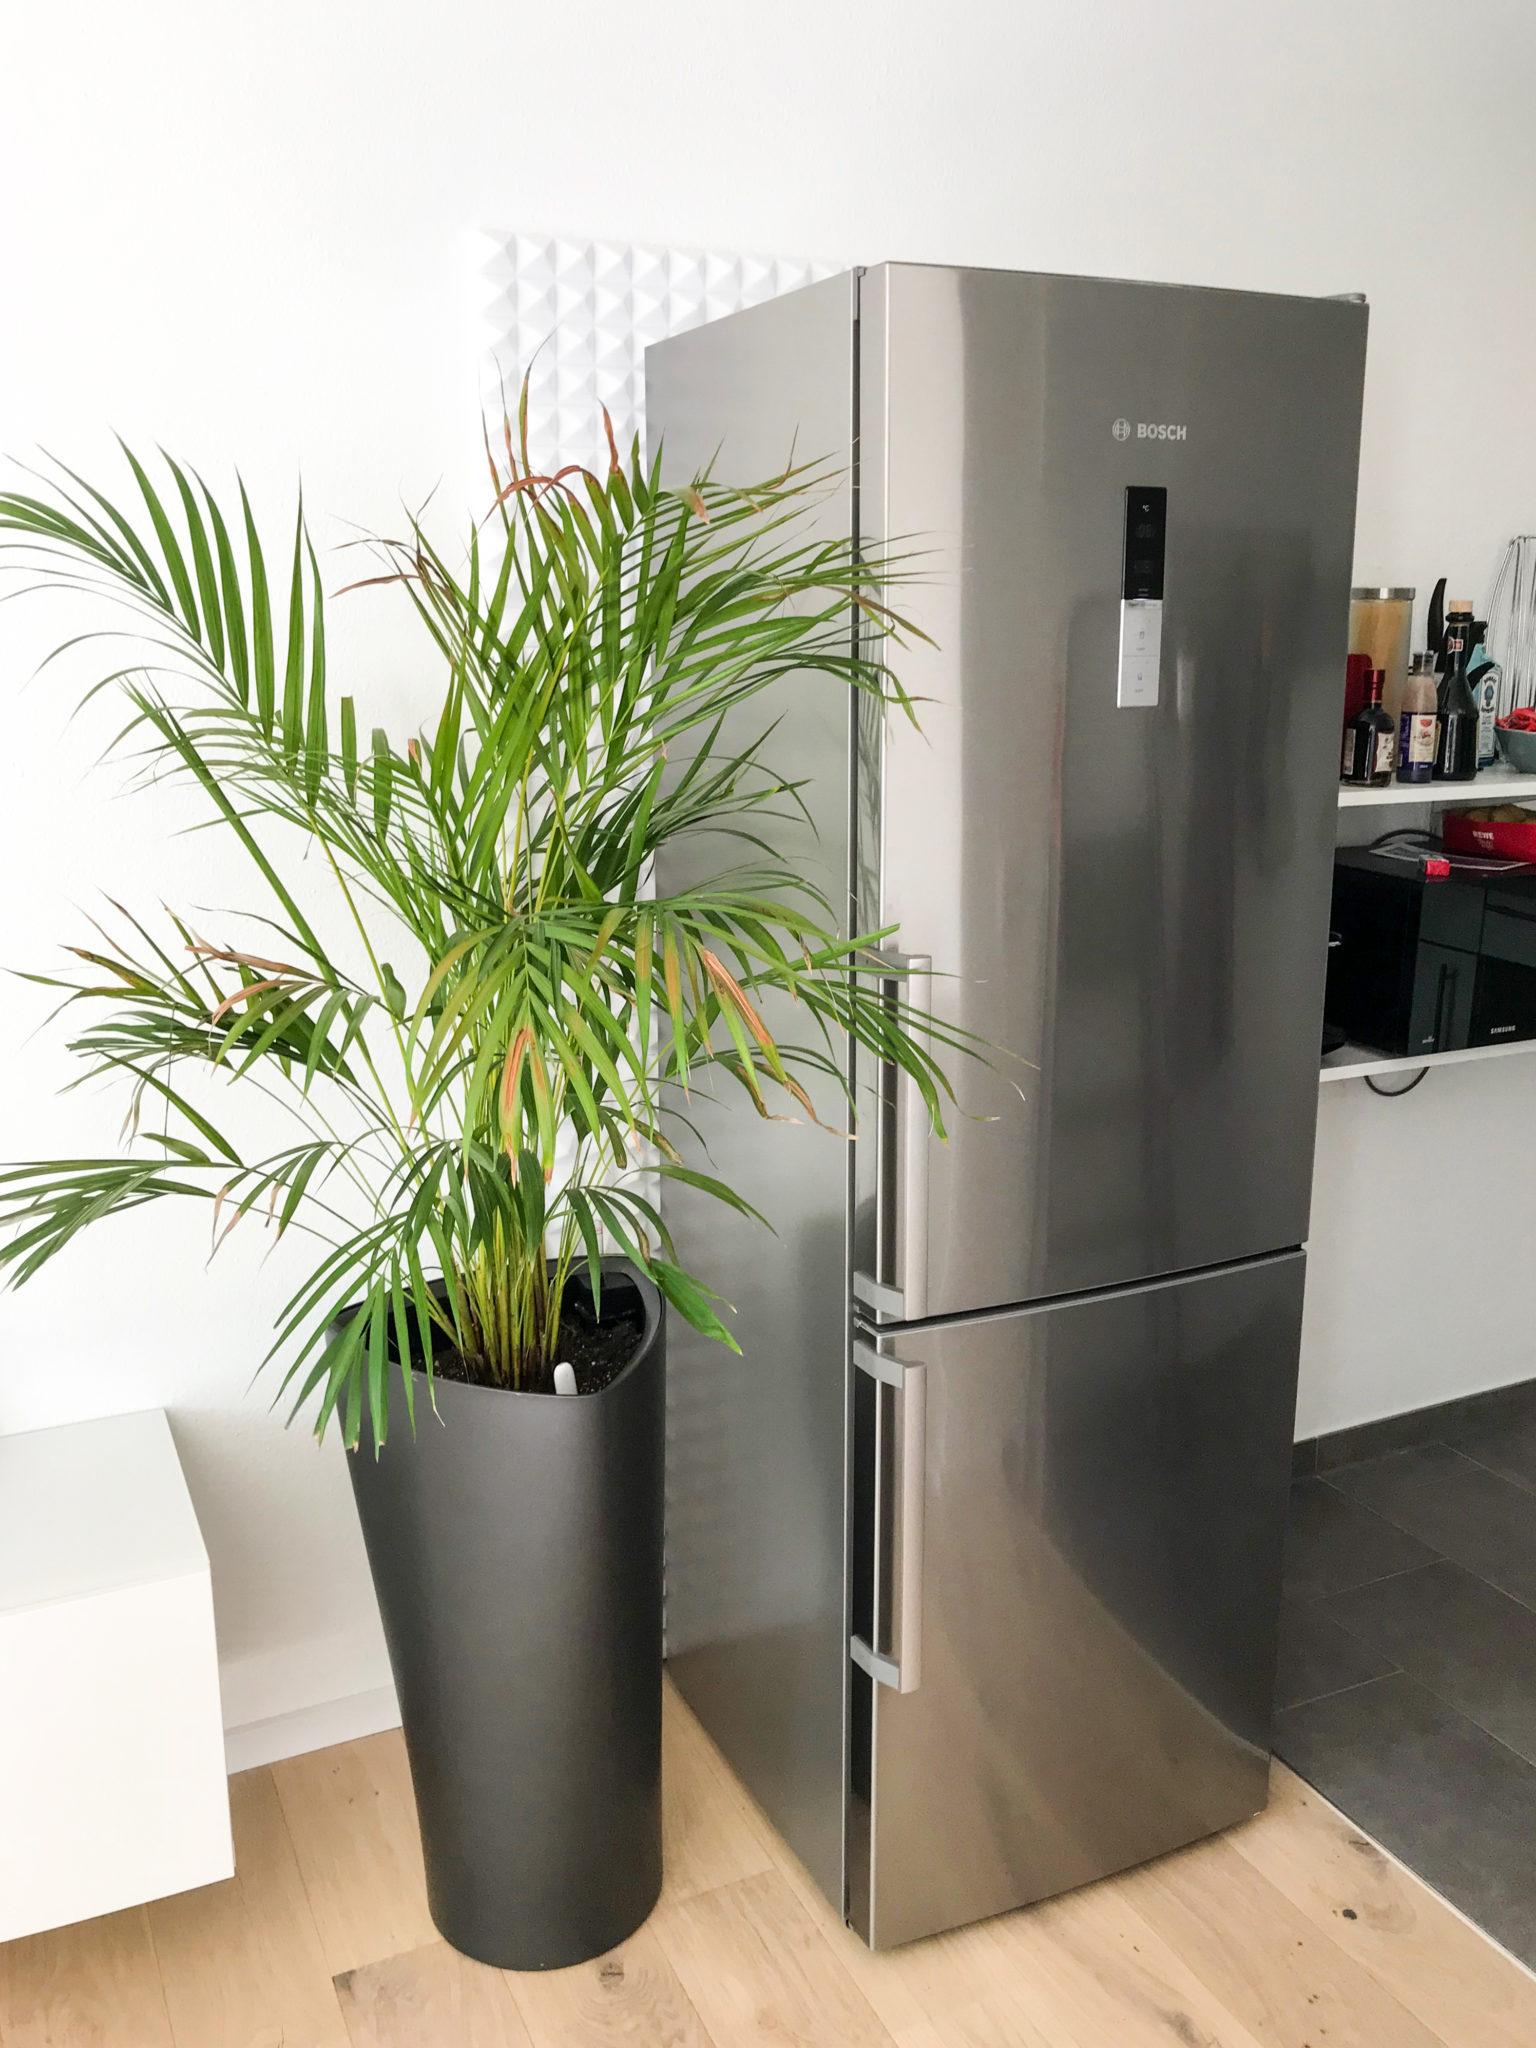 Extrem leiser Kühlschrank / Kühl-Gefrier-Kombination in ...